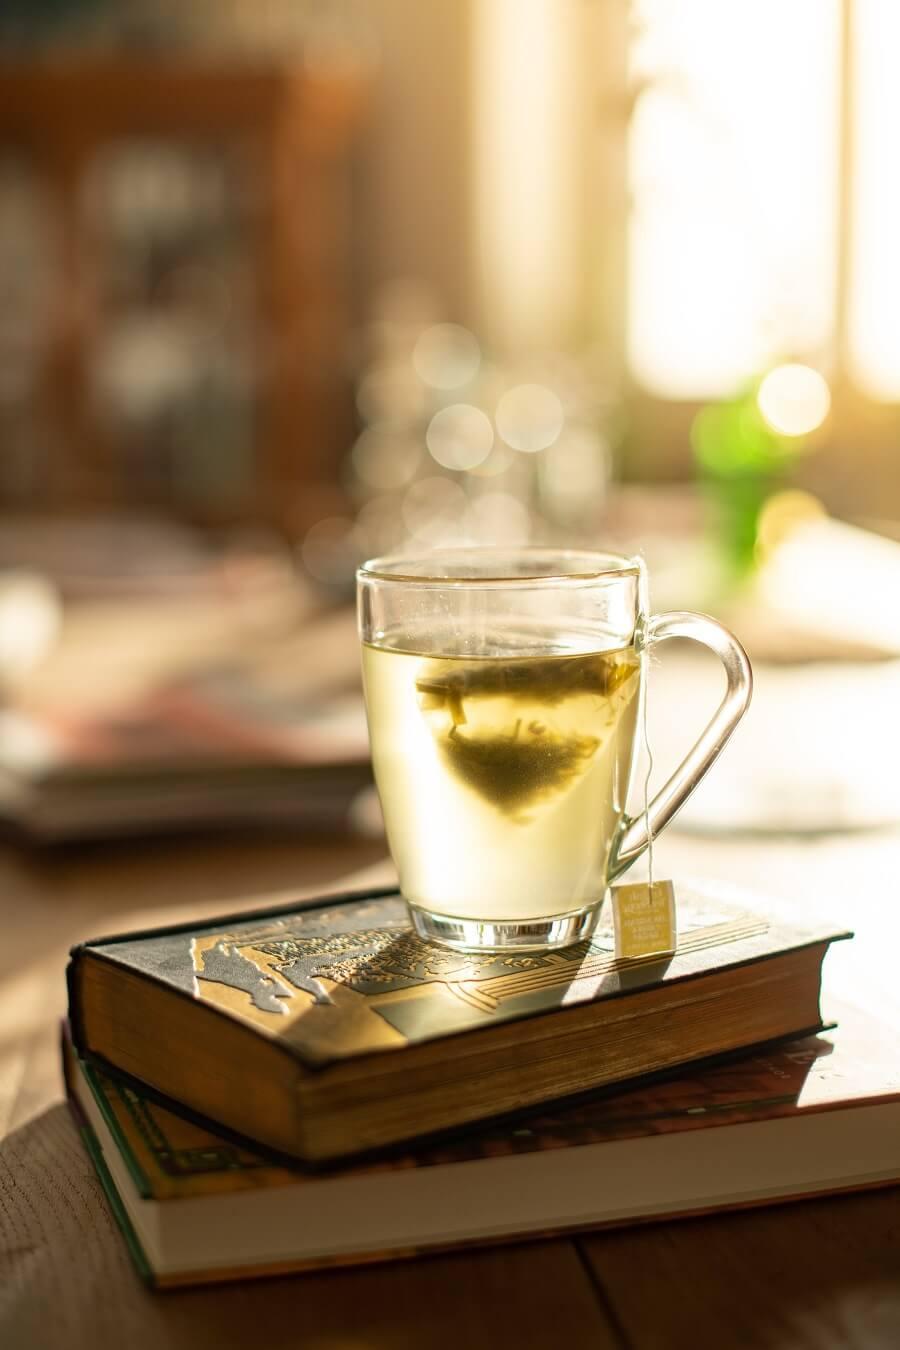 Tasse mit heißem Pyramidenbeutel-Tee